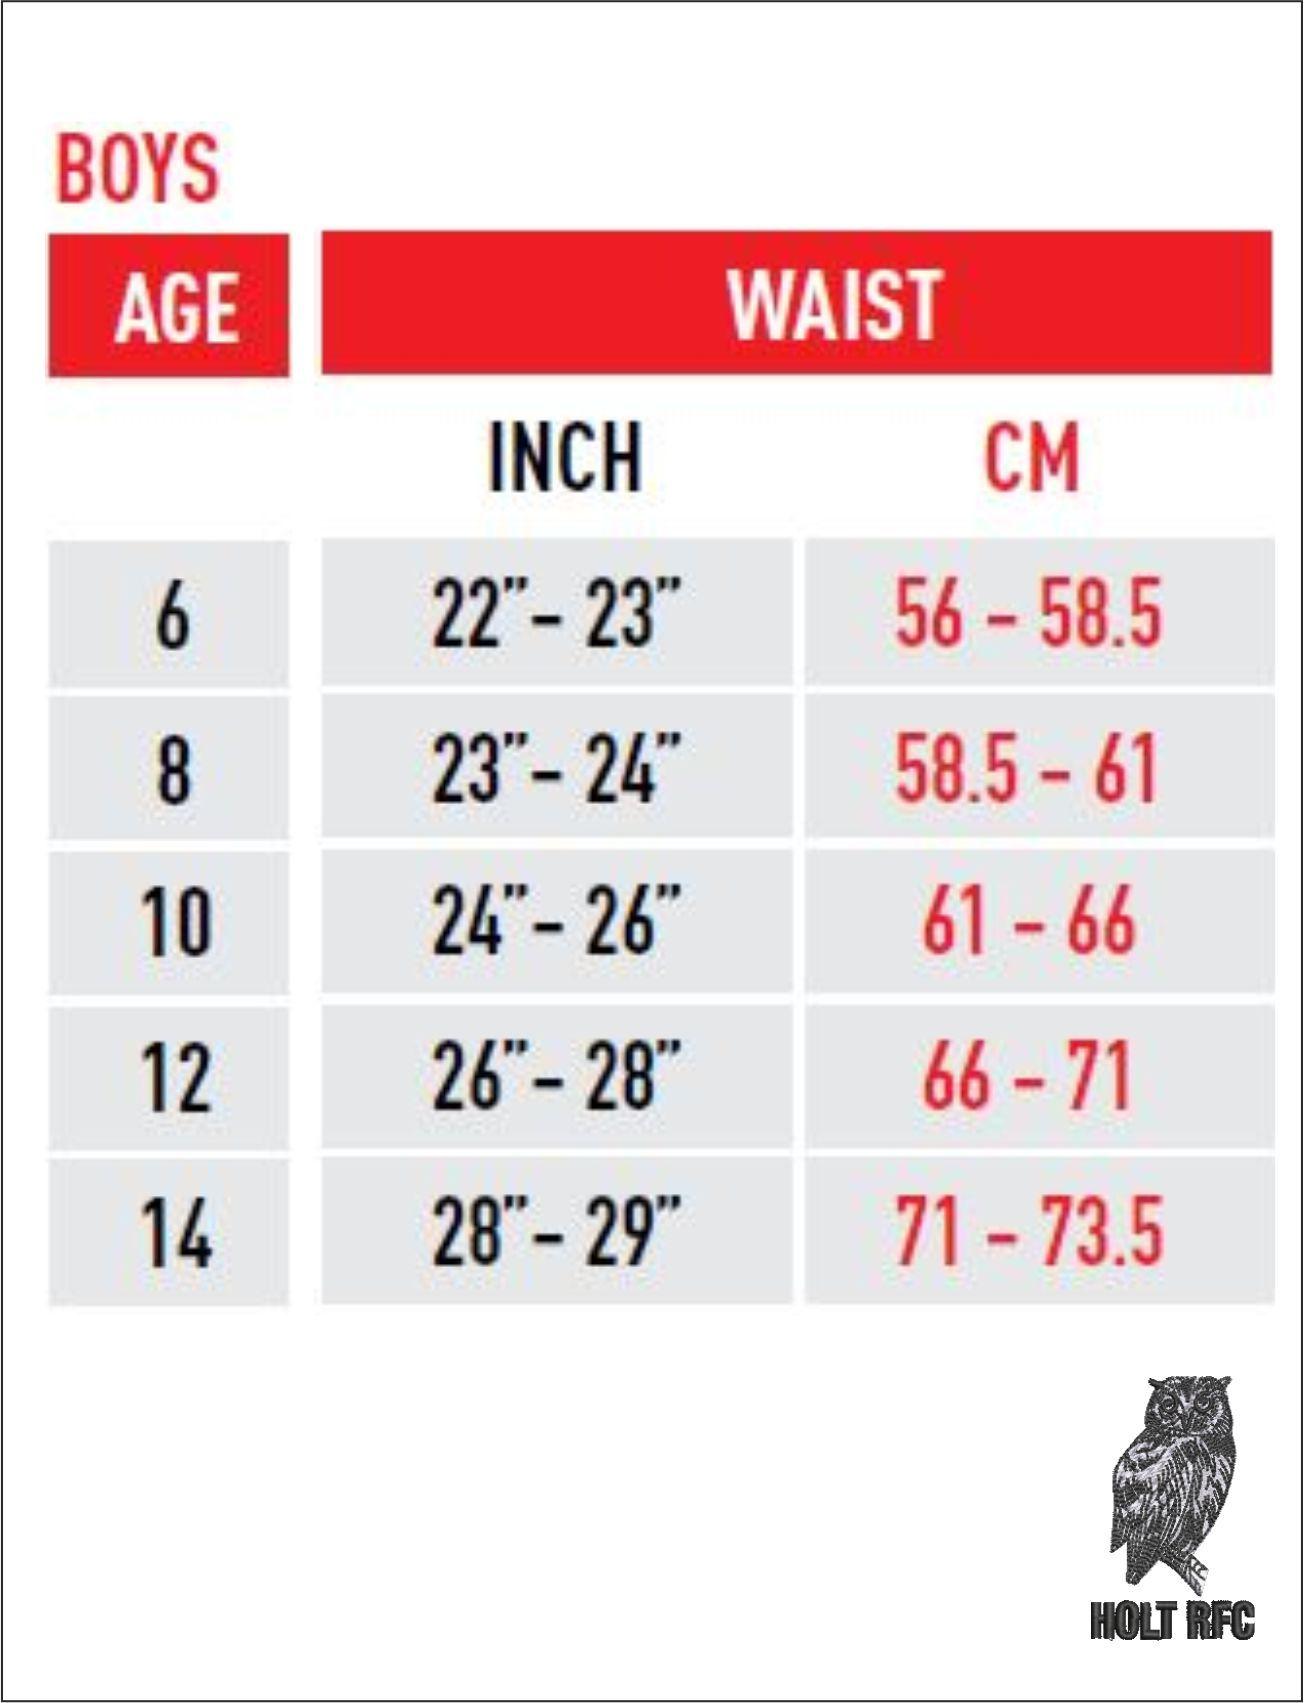 Boys Waist Size Guide